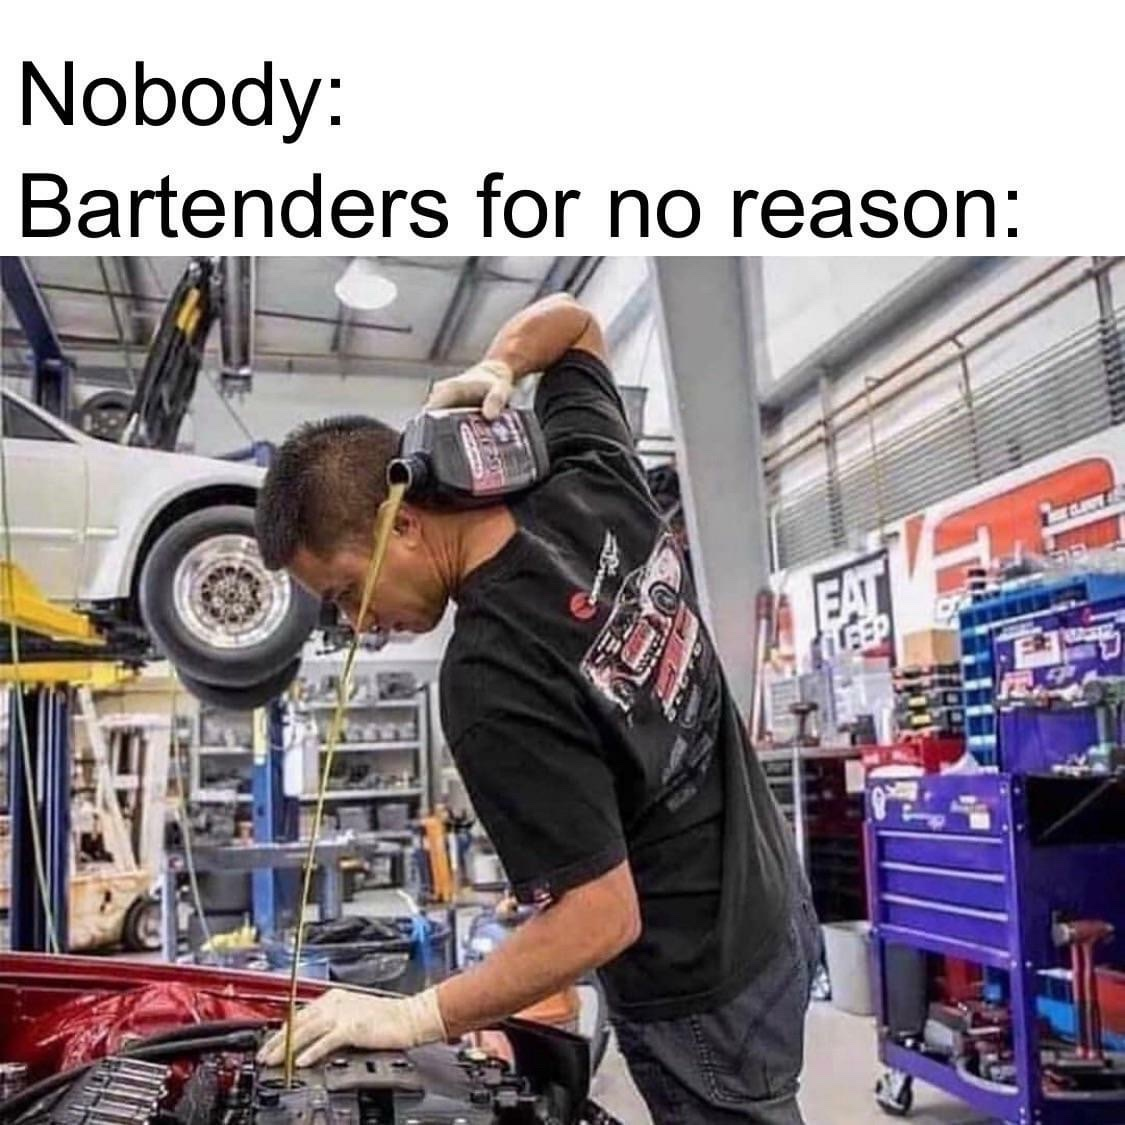 skills to pay bills - meme